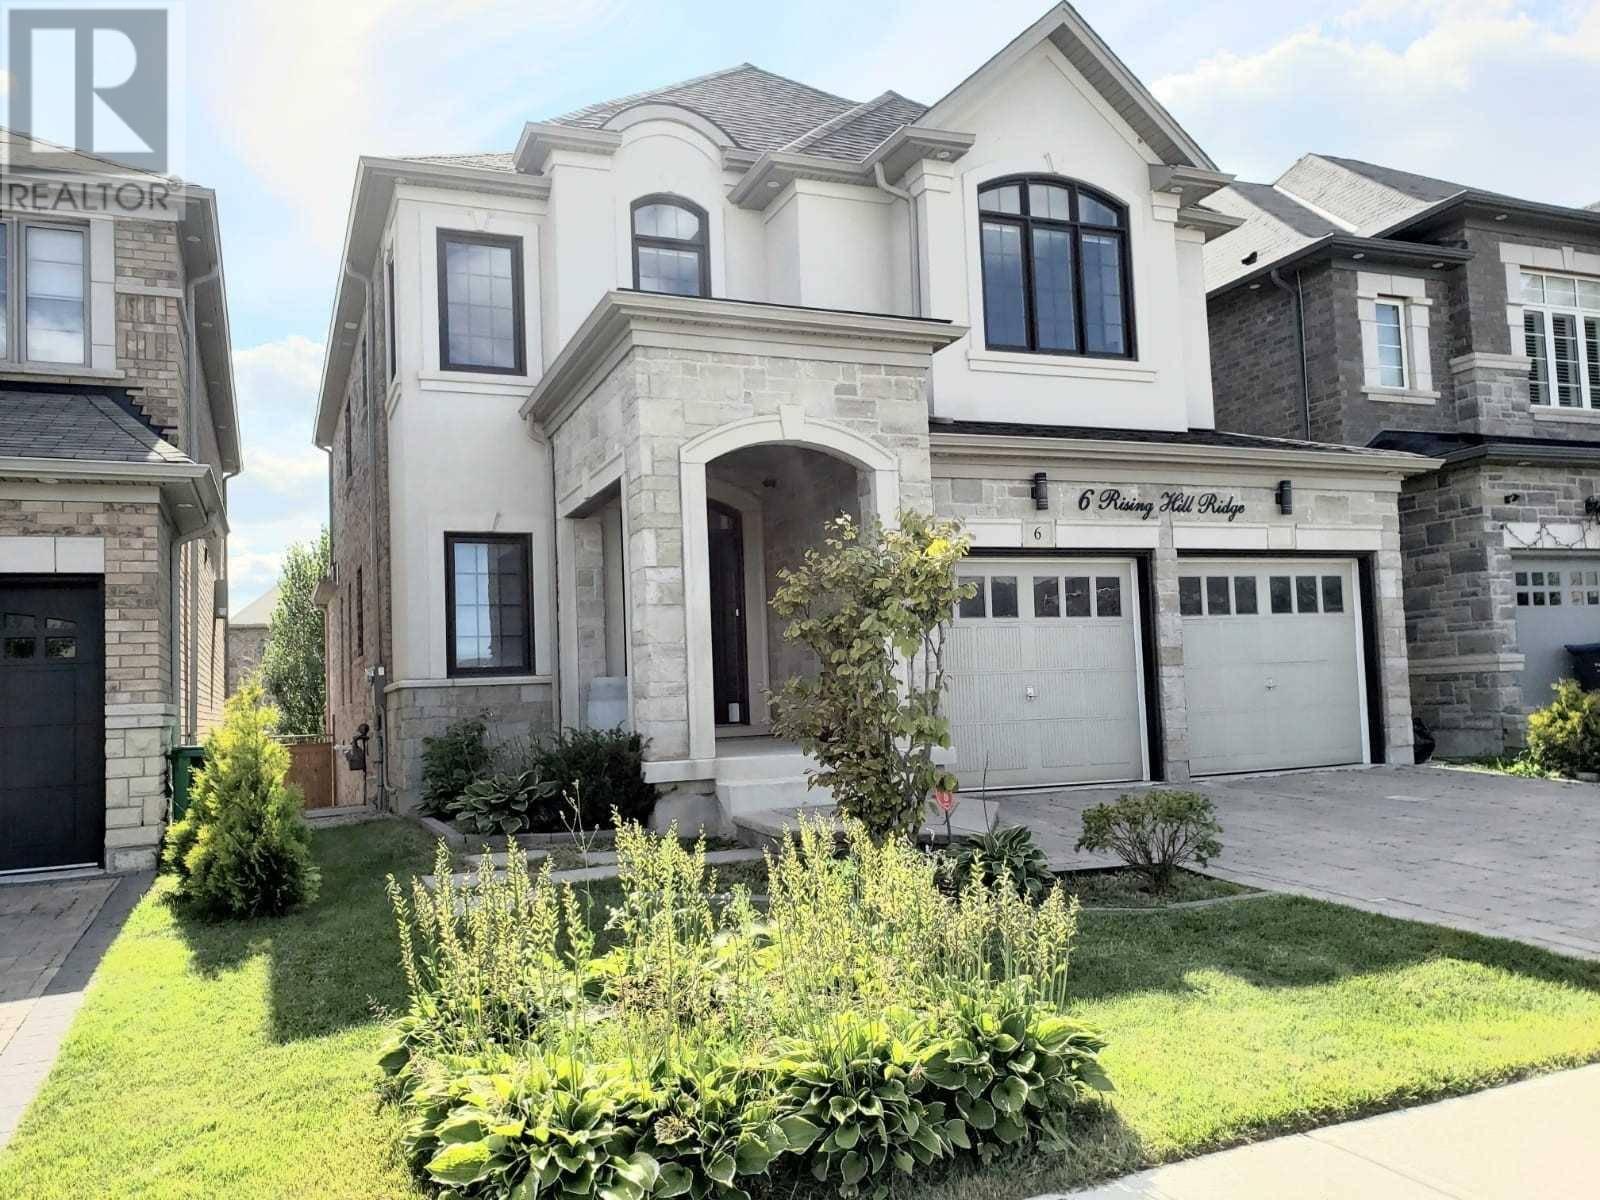 House for sale at 6 Rising Hill Rdge Unit Rdge Brampton Ontario - MLS: W4570713